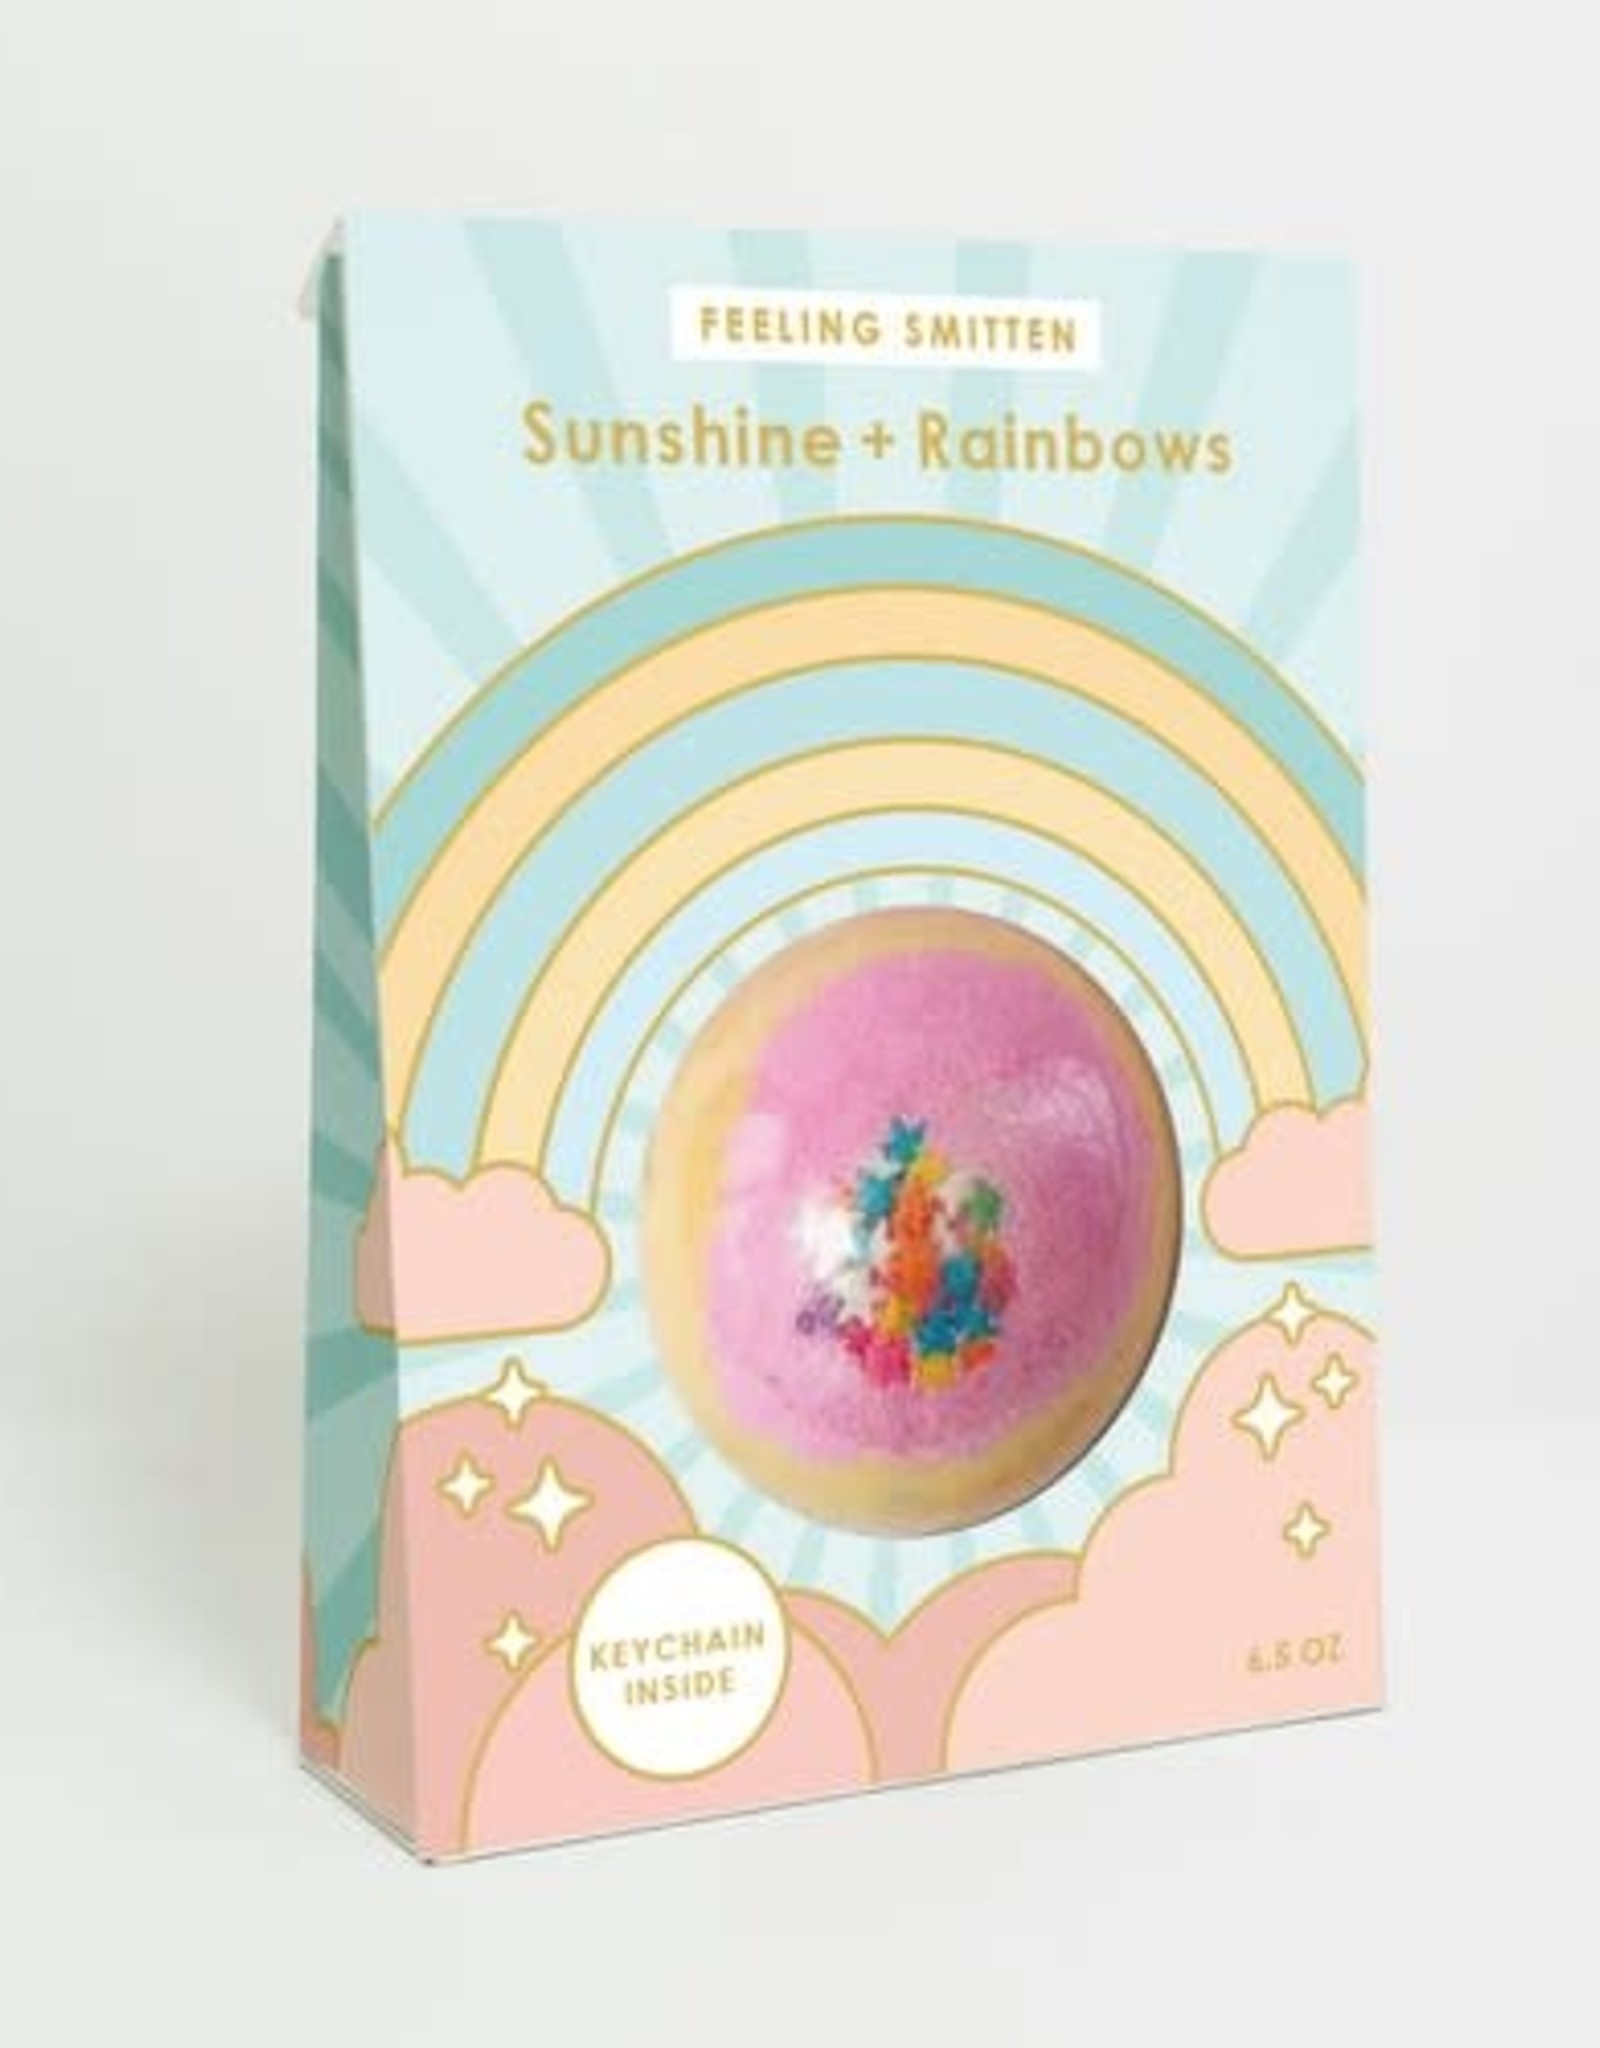 Feeling Smitten Sunshine + Rainbows Bath Bomb